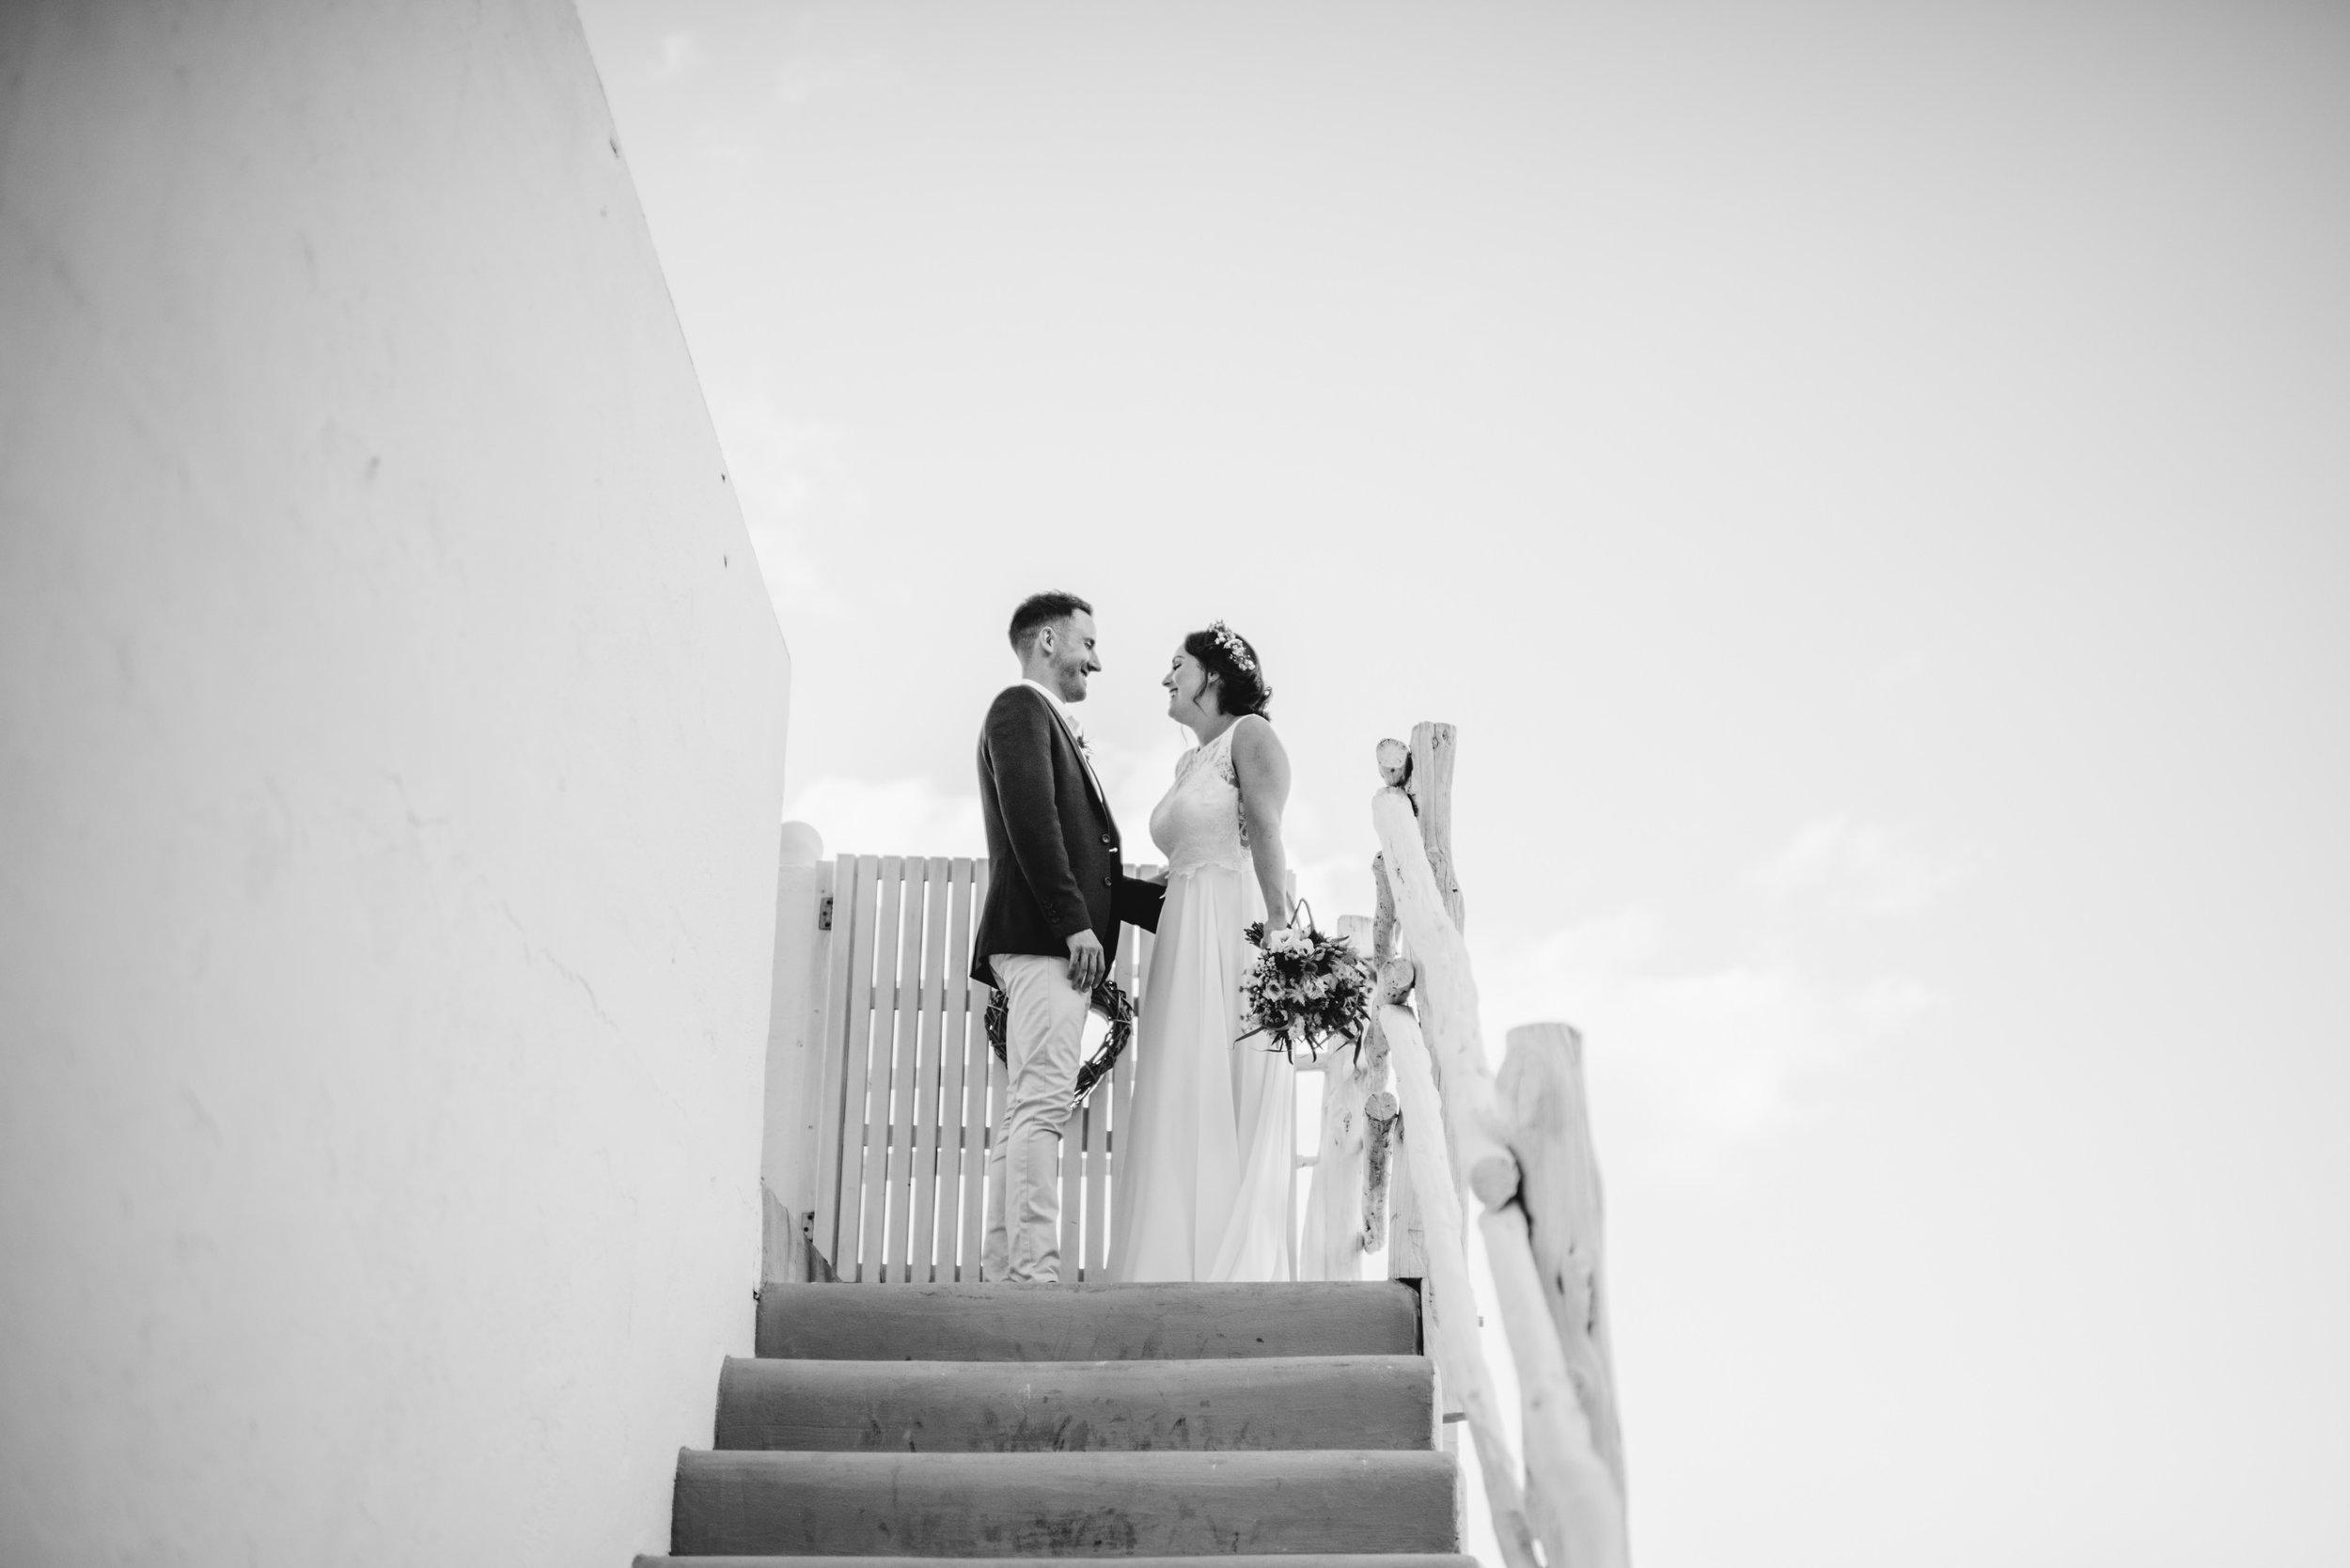 0113-IBIZA-ELIXIR-BEACH-CLUB-WEDDING-PHOTOGRAPHY-ALTERNATIVE-WEDDING-PHOTOGRAPHY.JPG